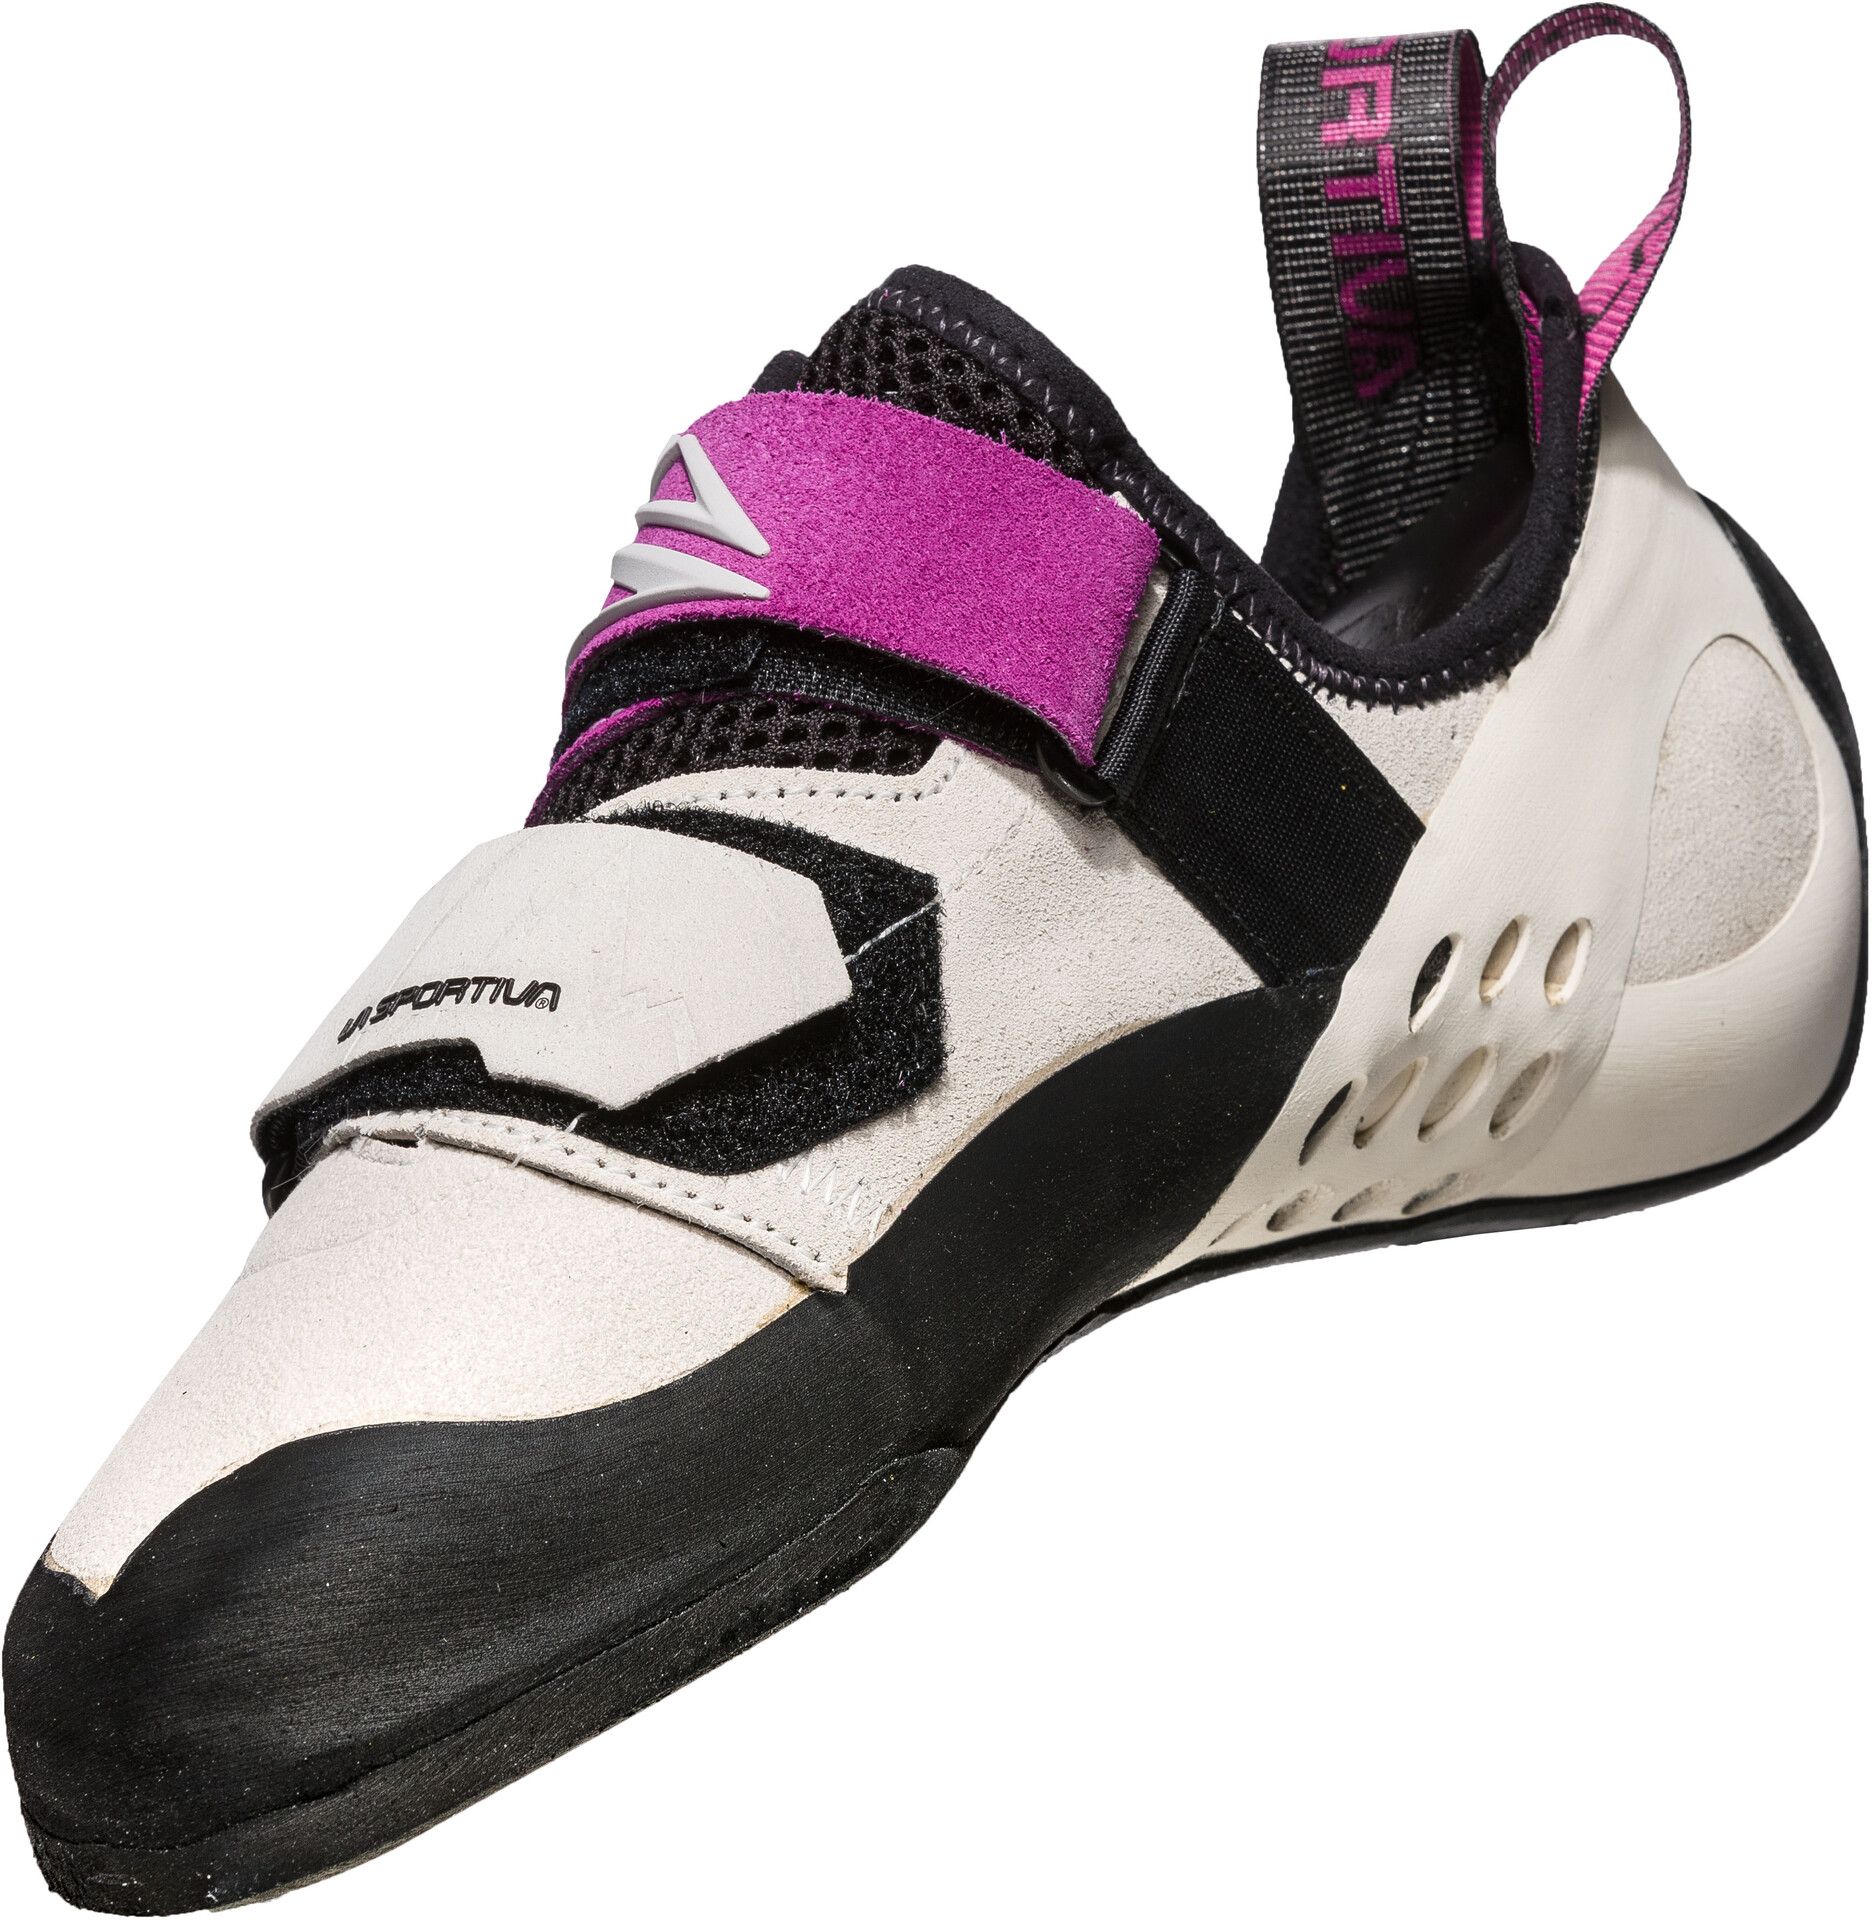 La Chaussures Sur Roseblanc D'escalade Sportiva Katana Femme w8On0Pk